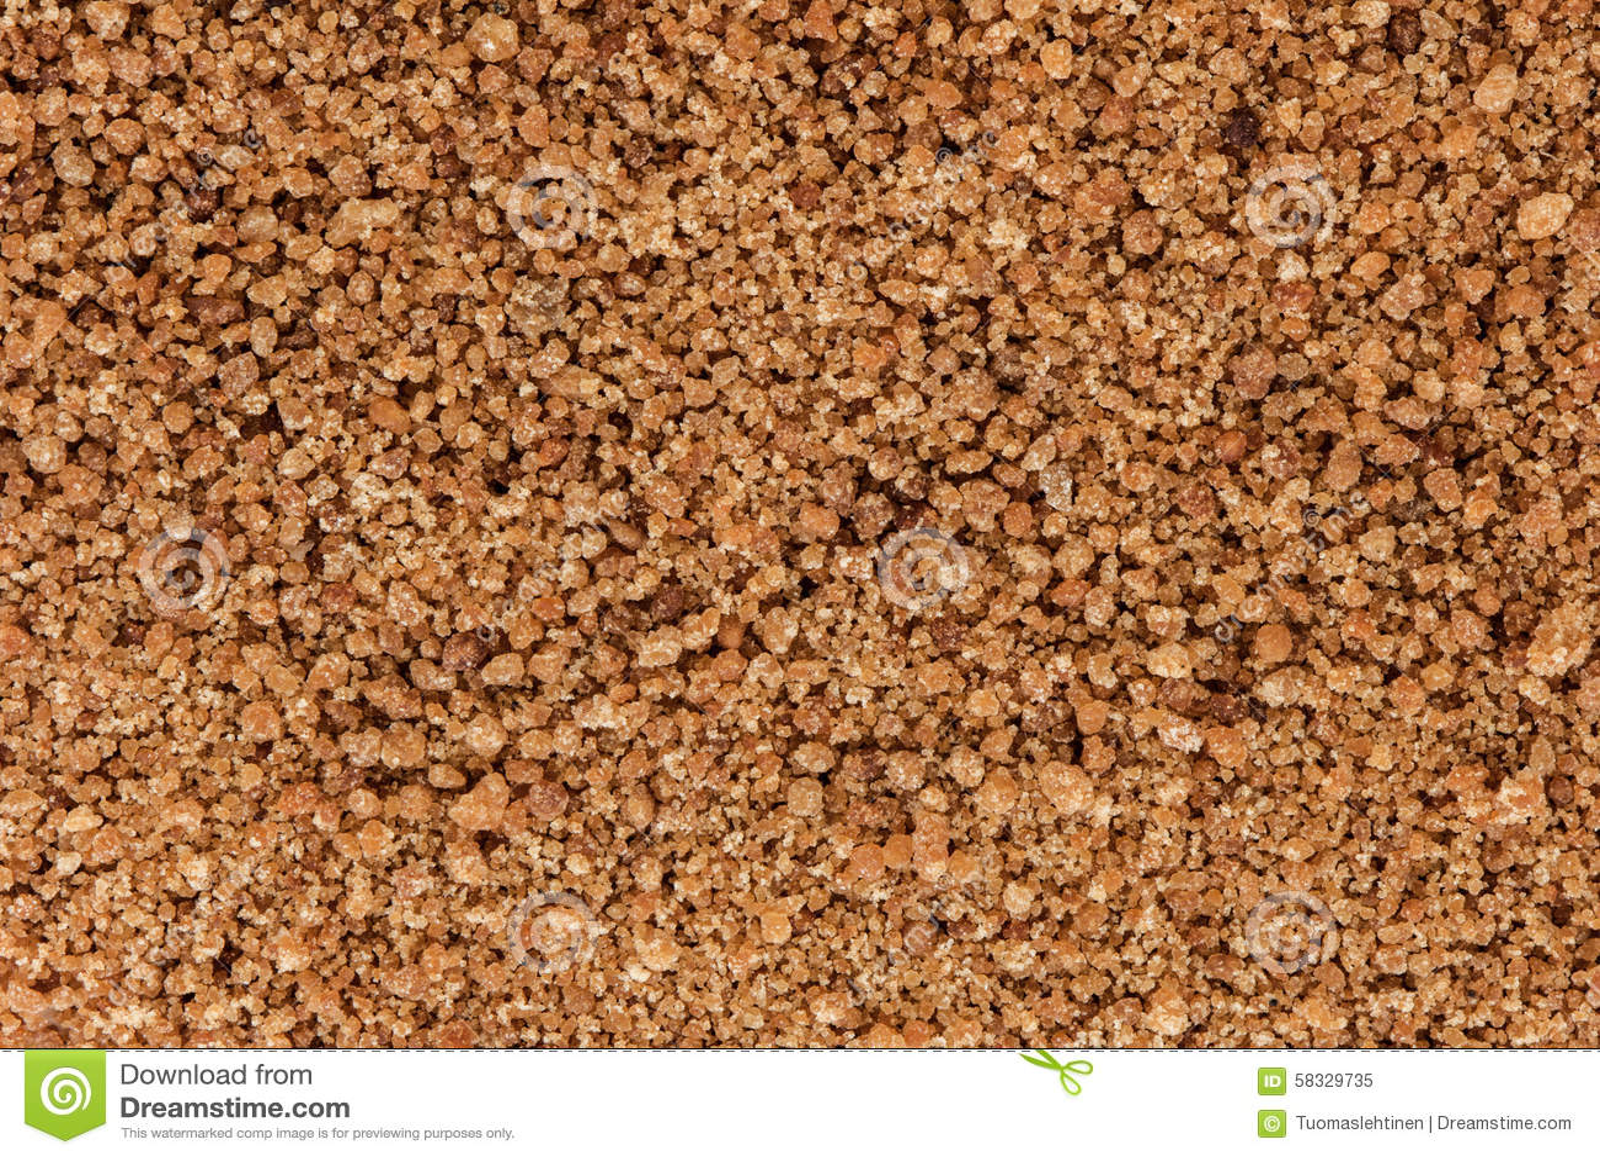 fond de sucre brun de cocotier image stock image du normal nourriture 58329735. Black Bedroom Furniture Sets. Home Design Ideas